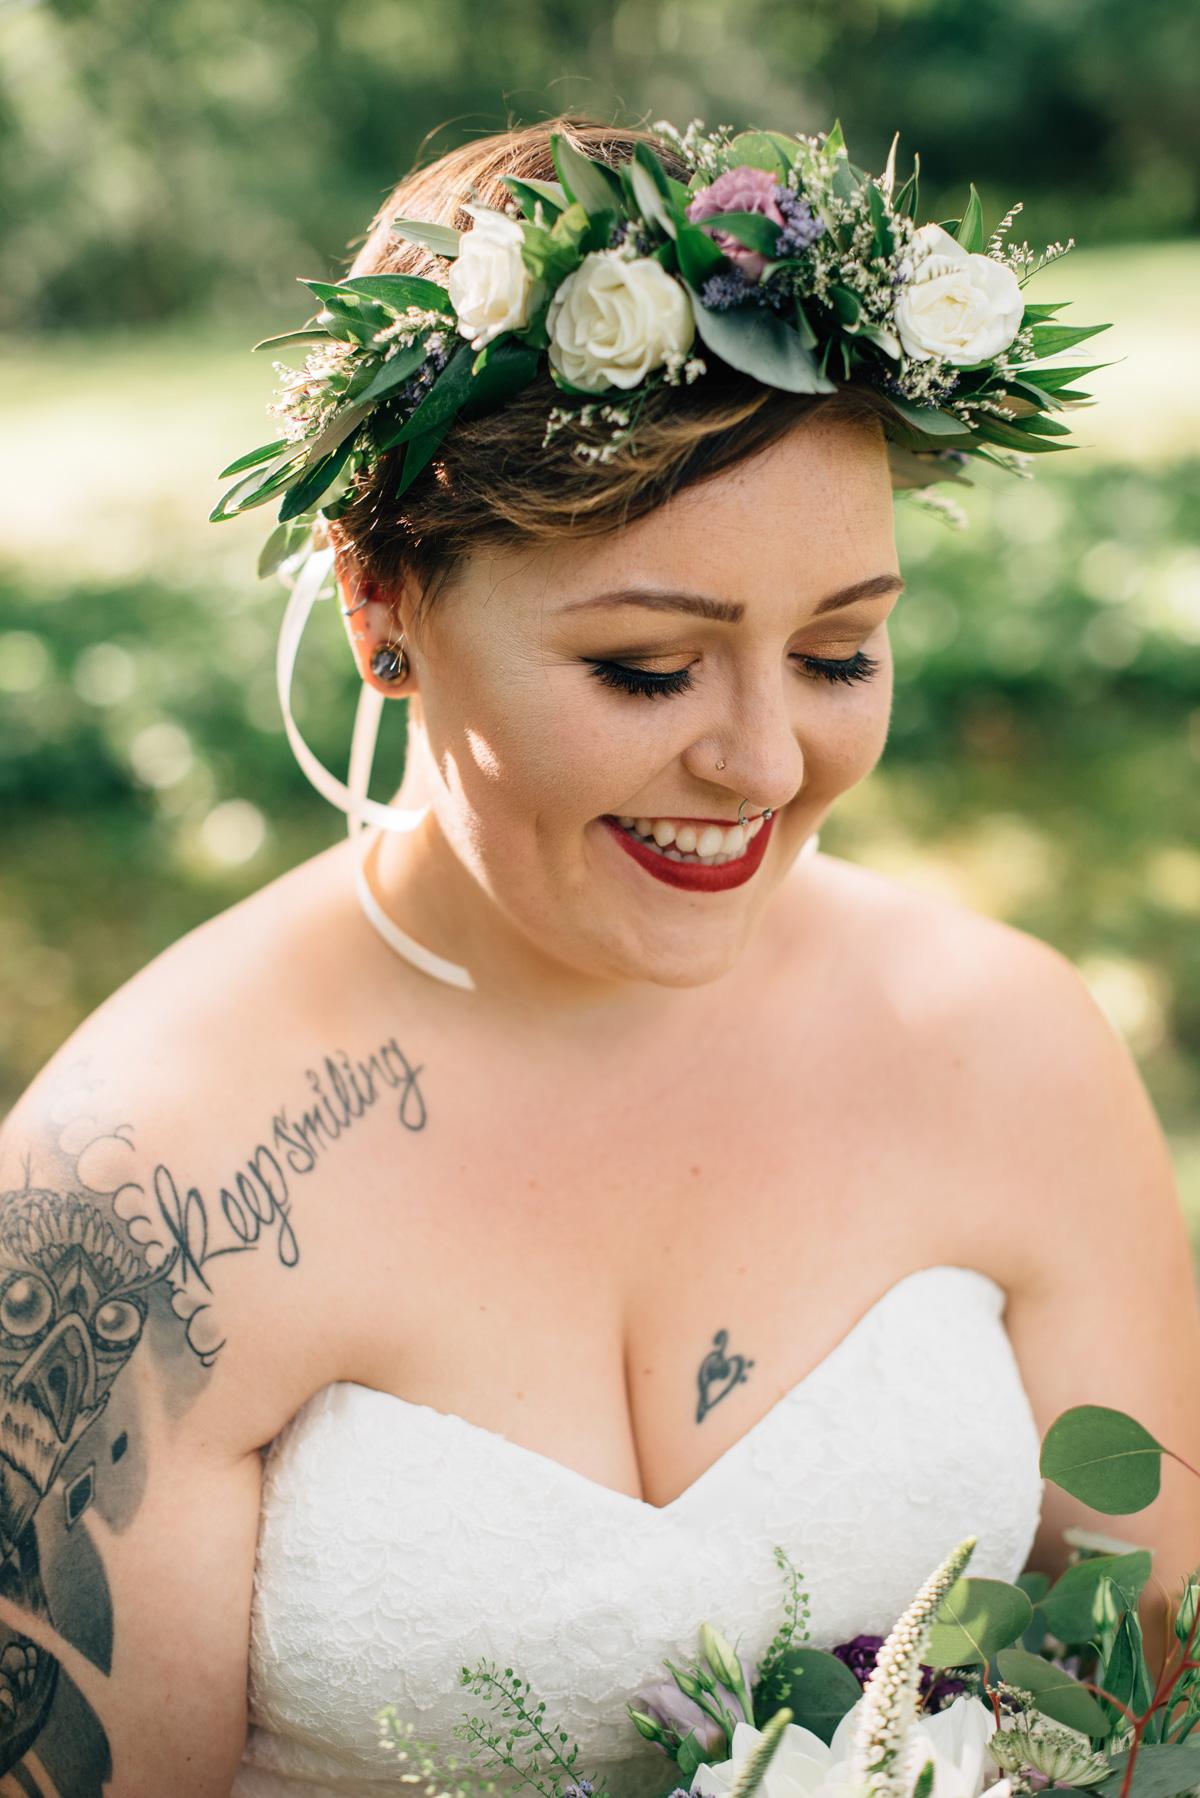 sara-wilde-photography-vineyard-bride-swish-list-beamer-falls-manor-grimsby-wedding-44.jpg